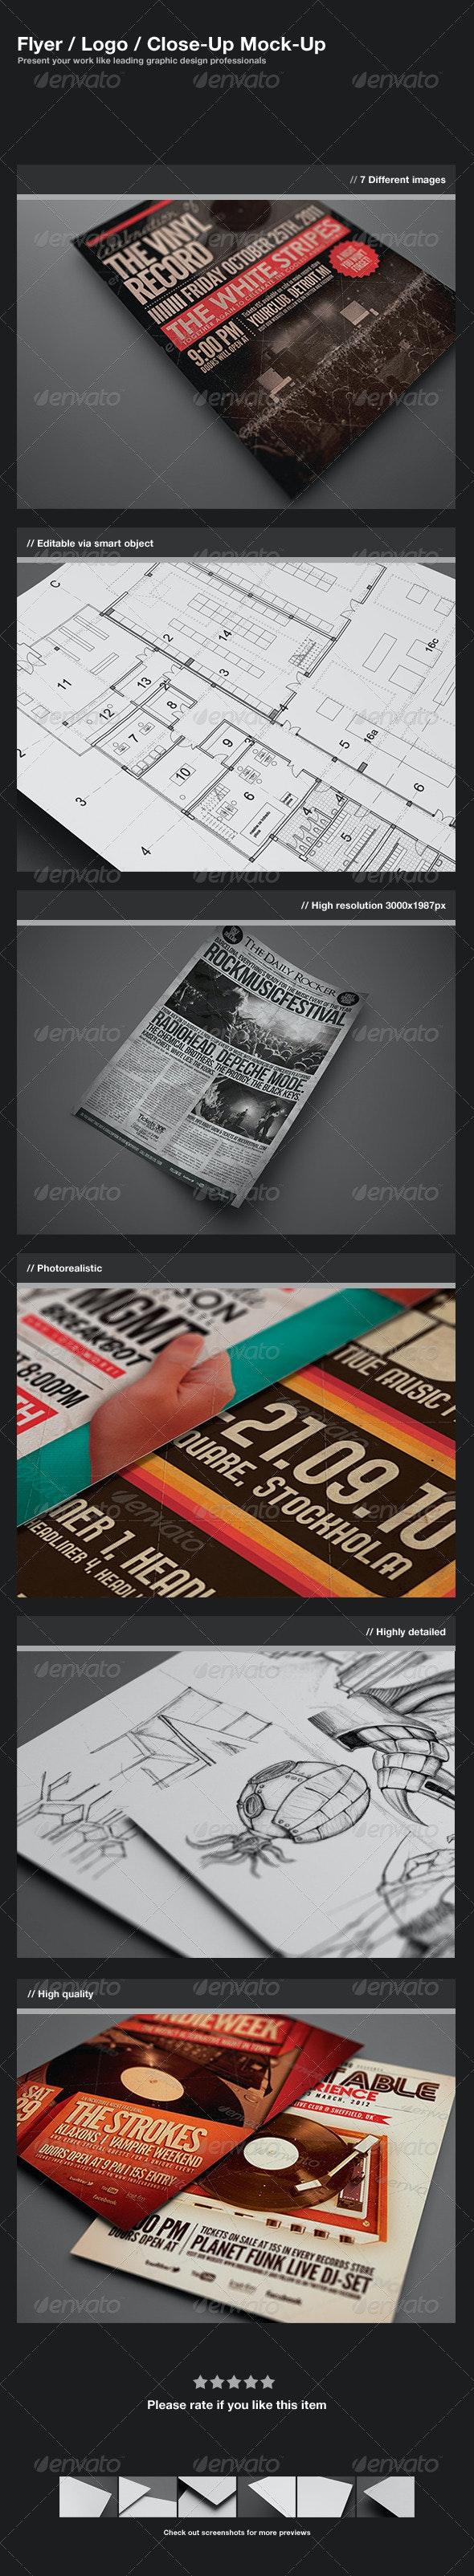 Flyer / Logo / Close-Up Mock-Up - Flyers Print